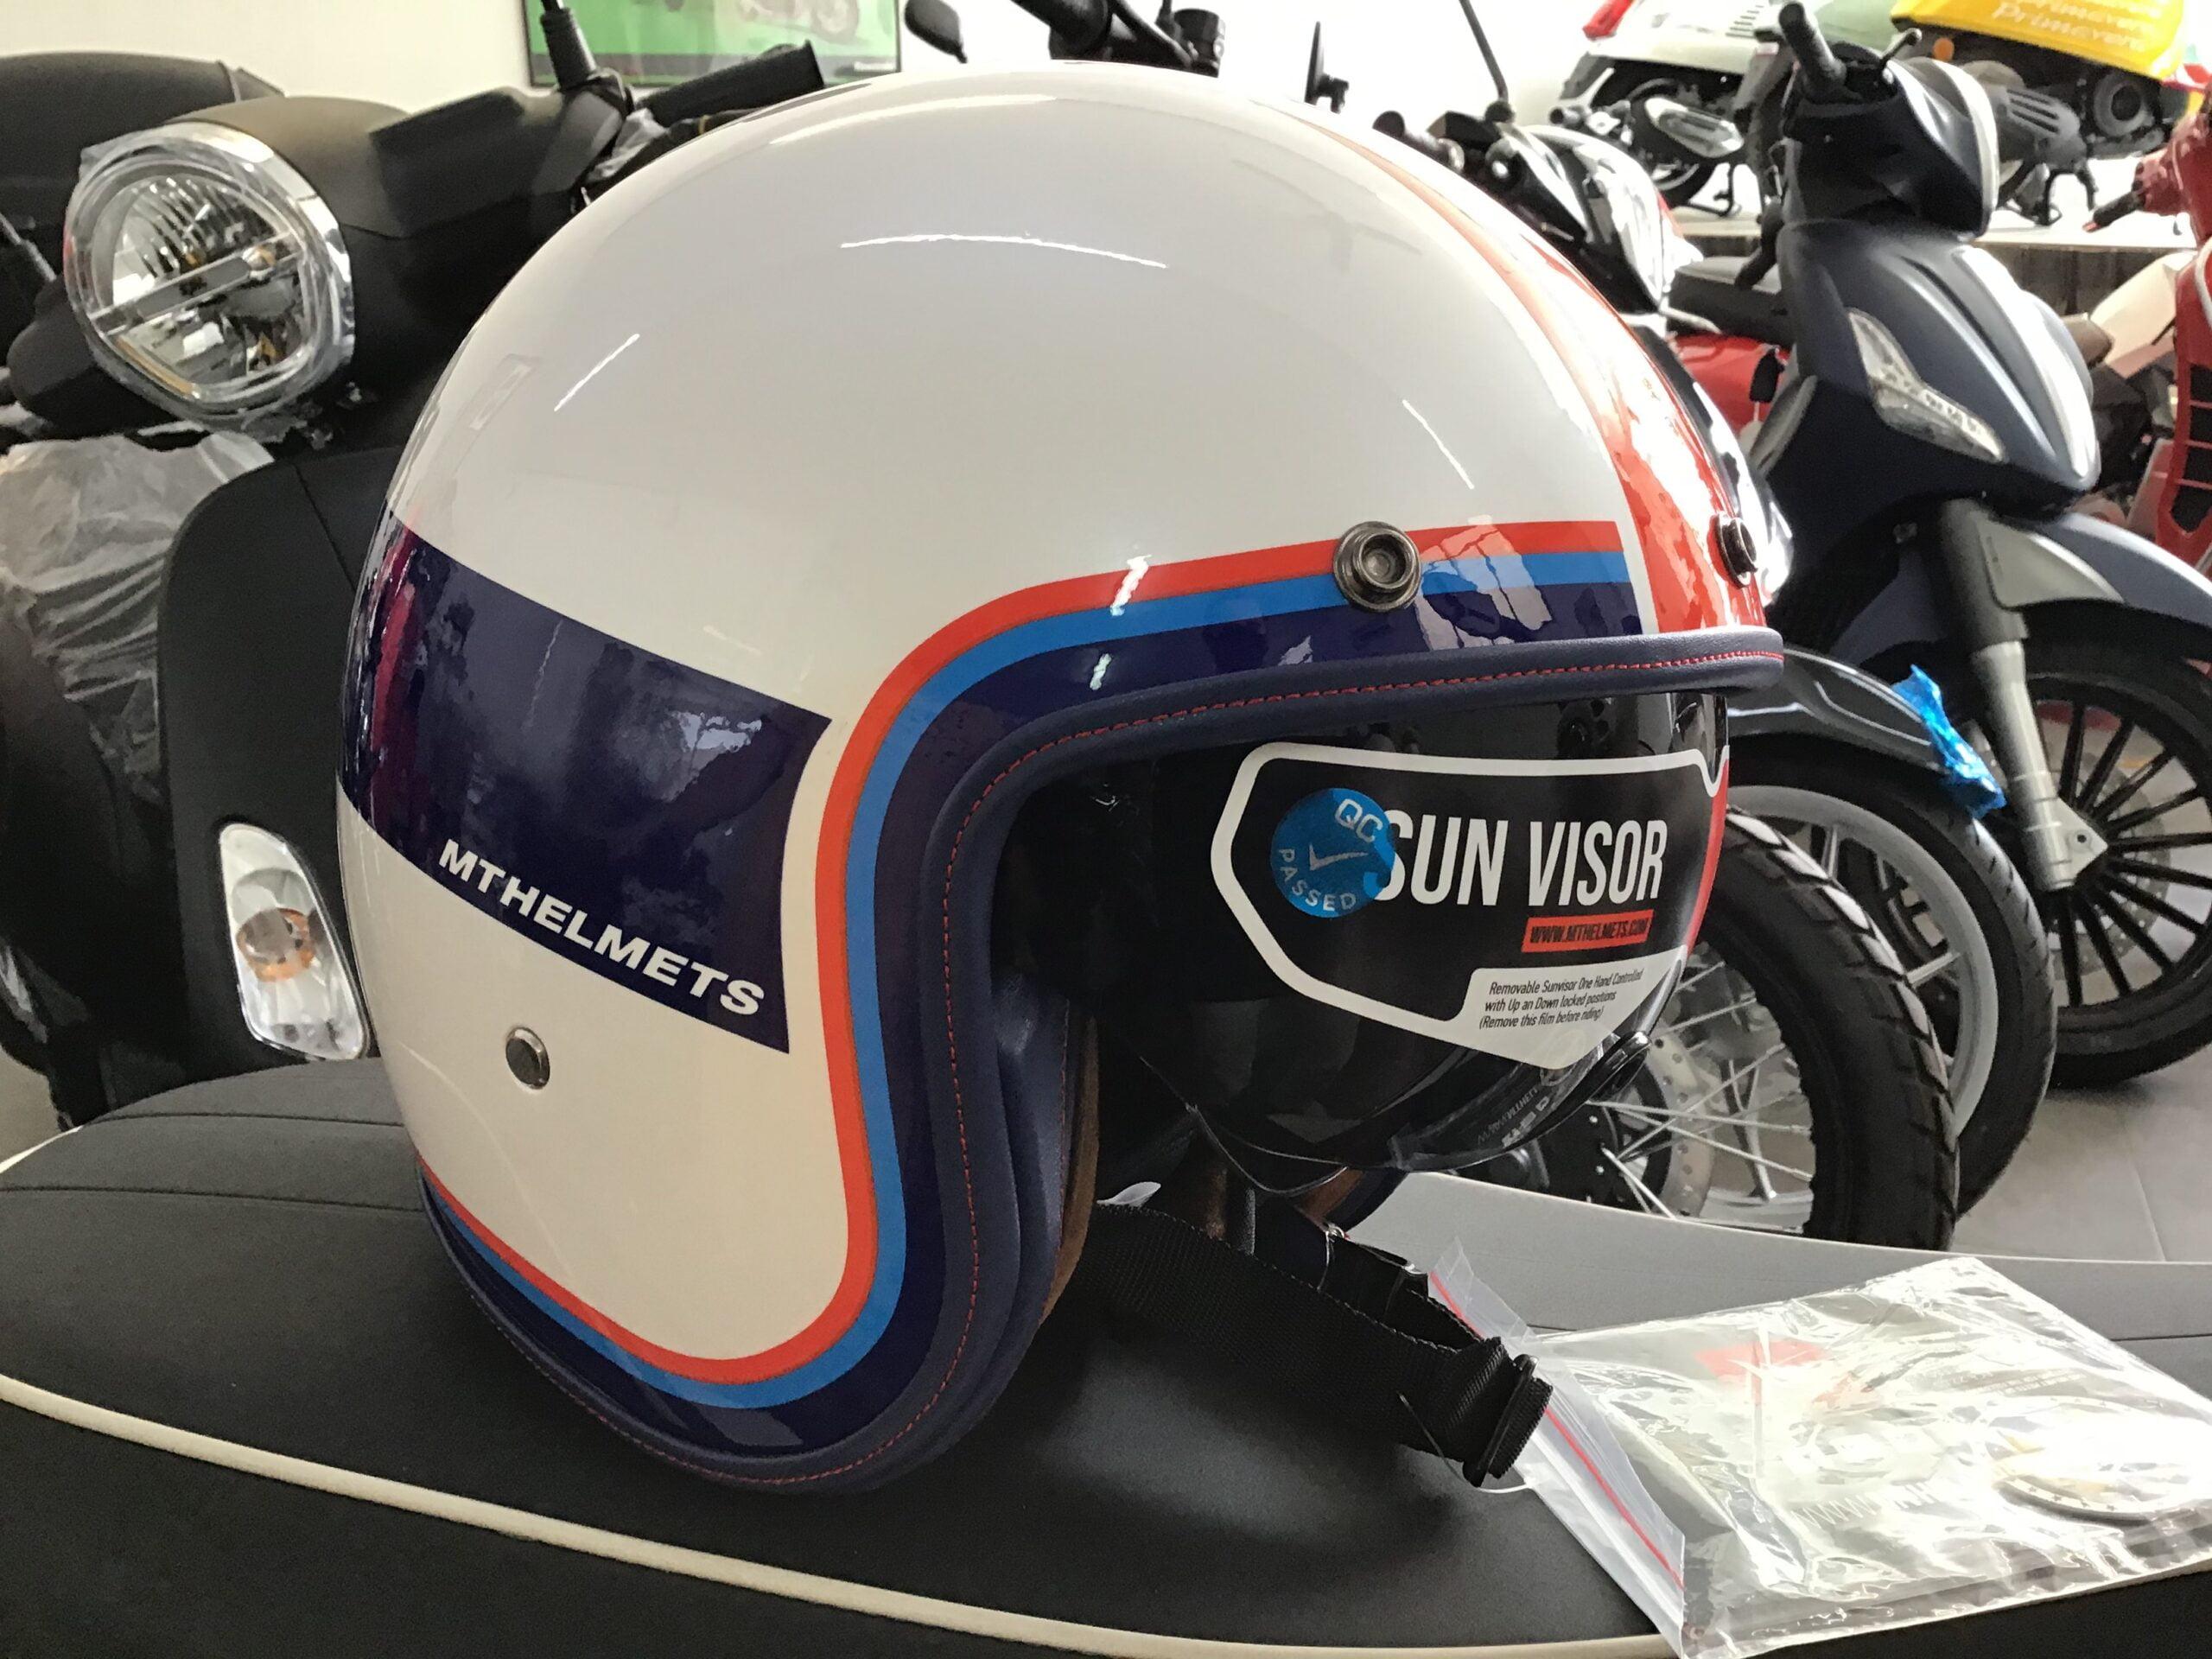 Sorteo casco – Paco's Motor